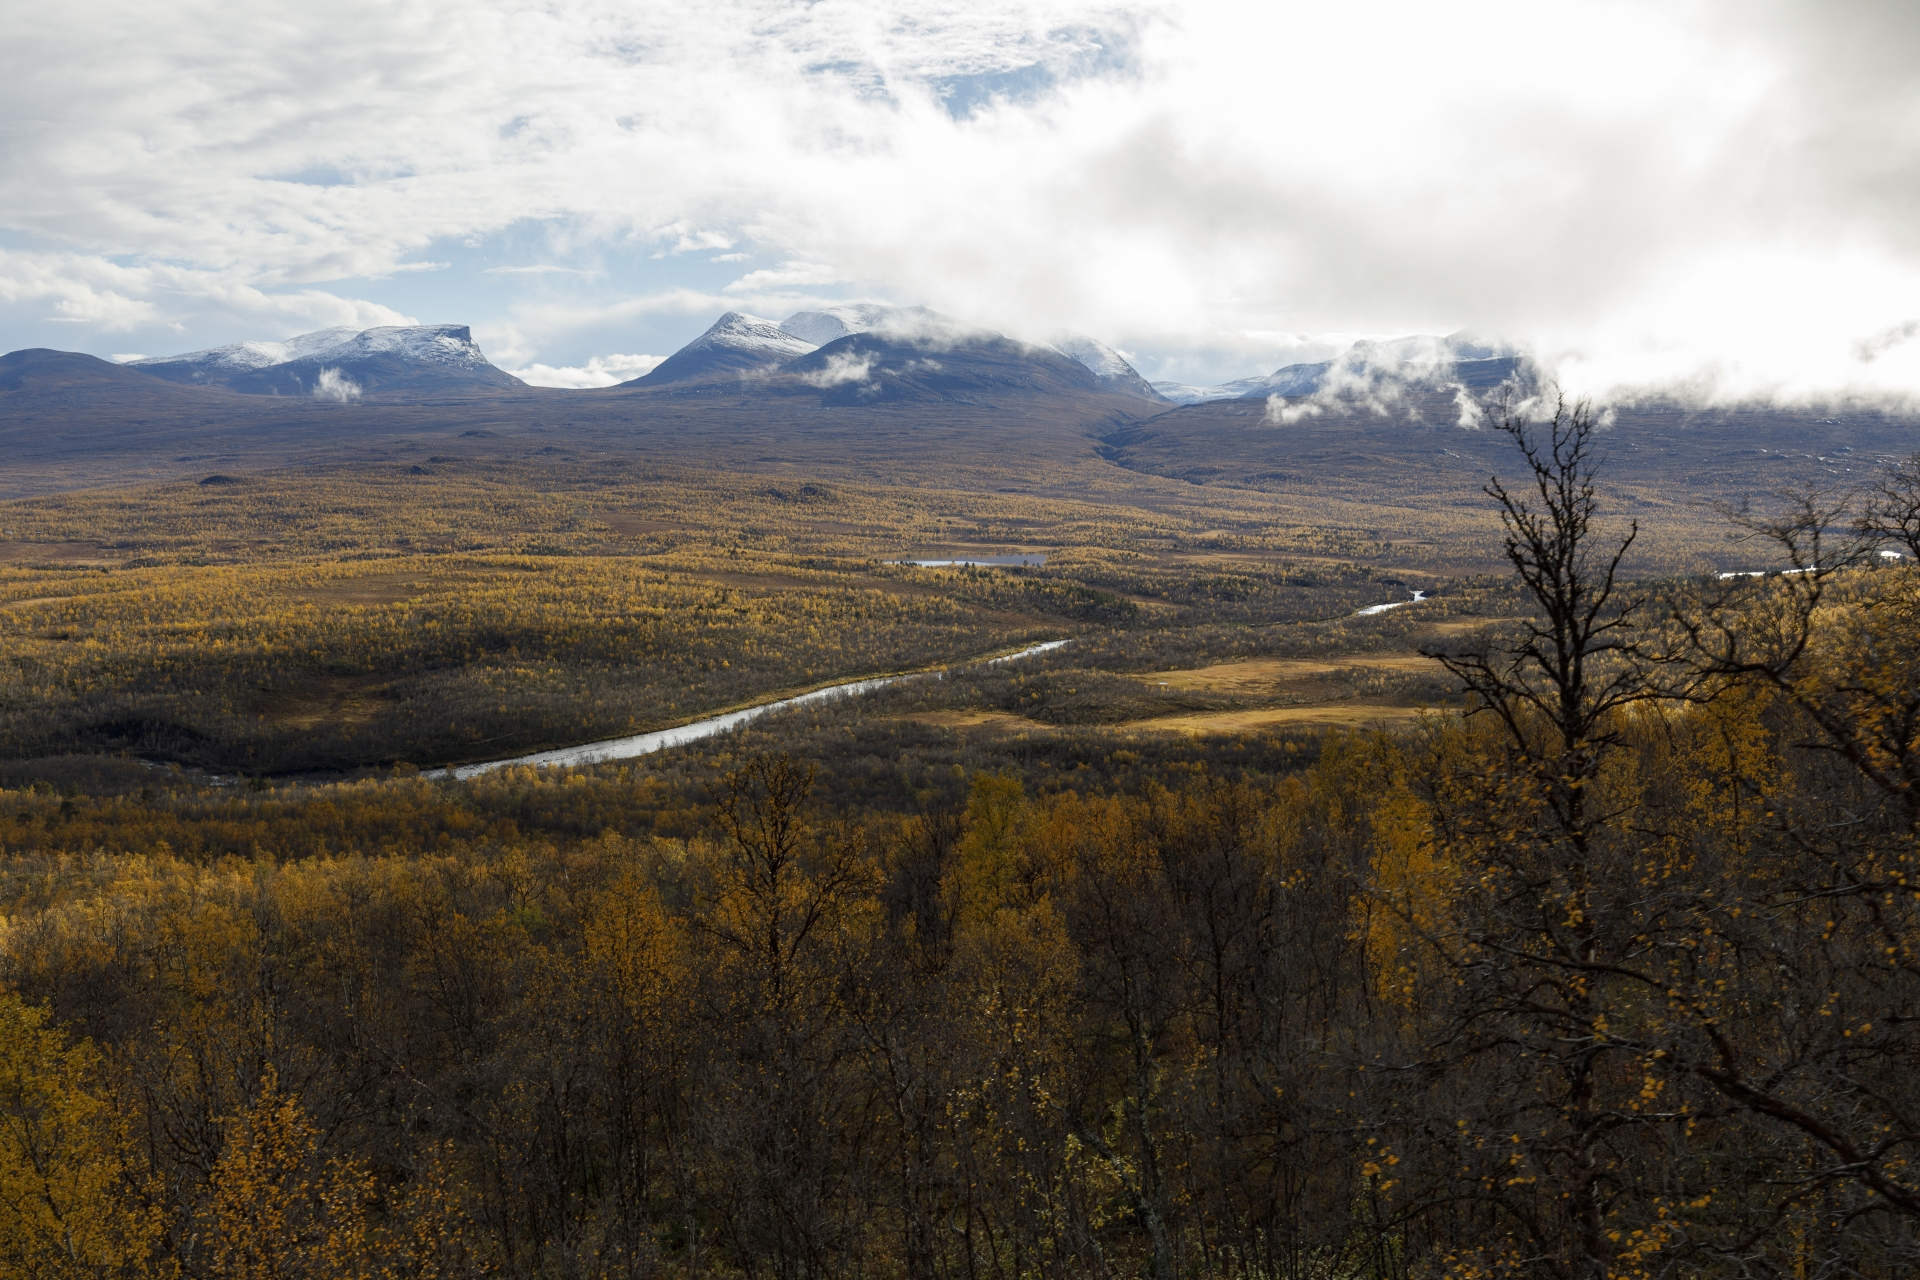 Abisko Natiopnalpark und Lapporten (Čuonjávággi) mit den Bergen  Tjuonatjåkka (1.554 m) und Nissuntjårro (1.738 m)